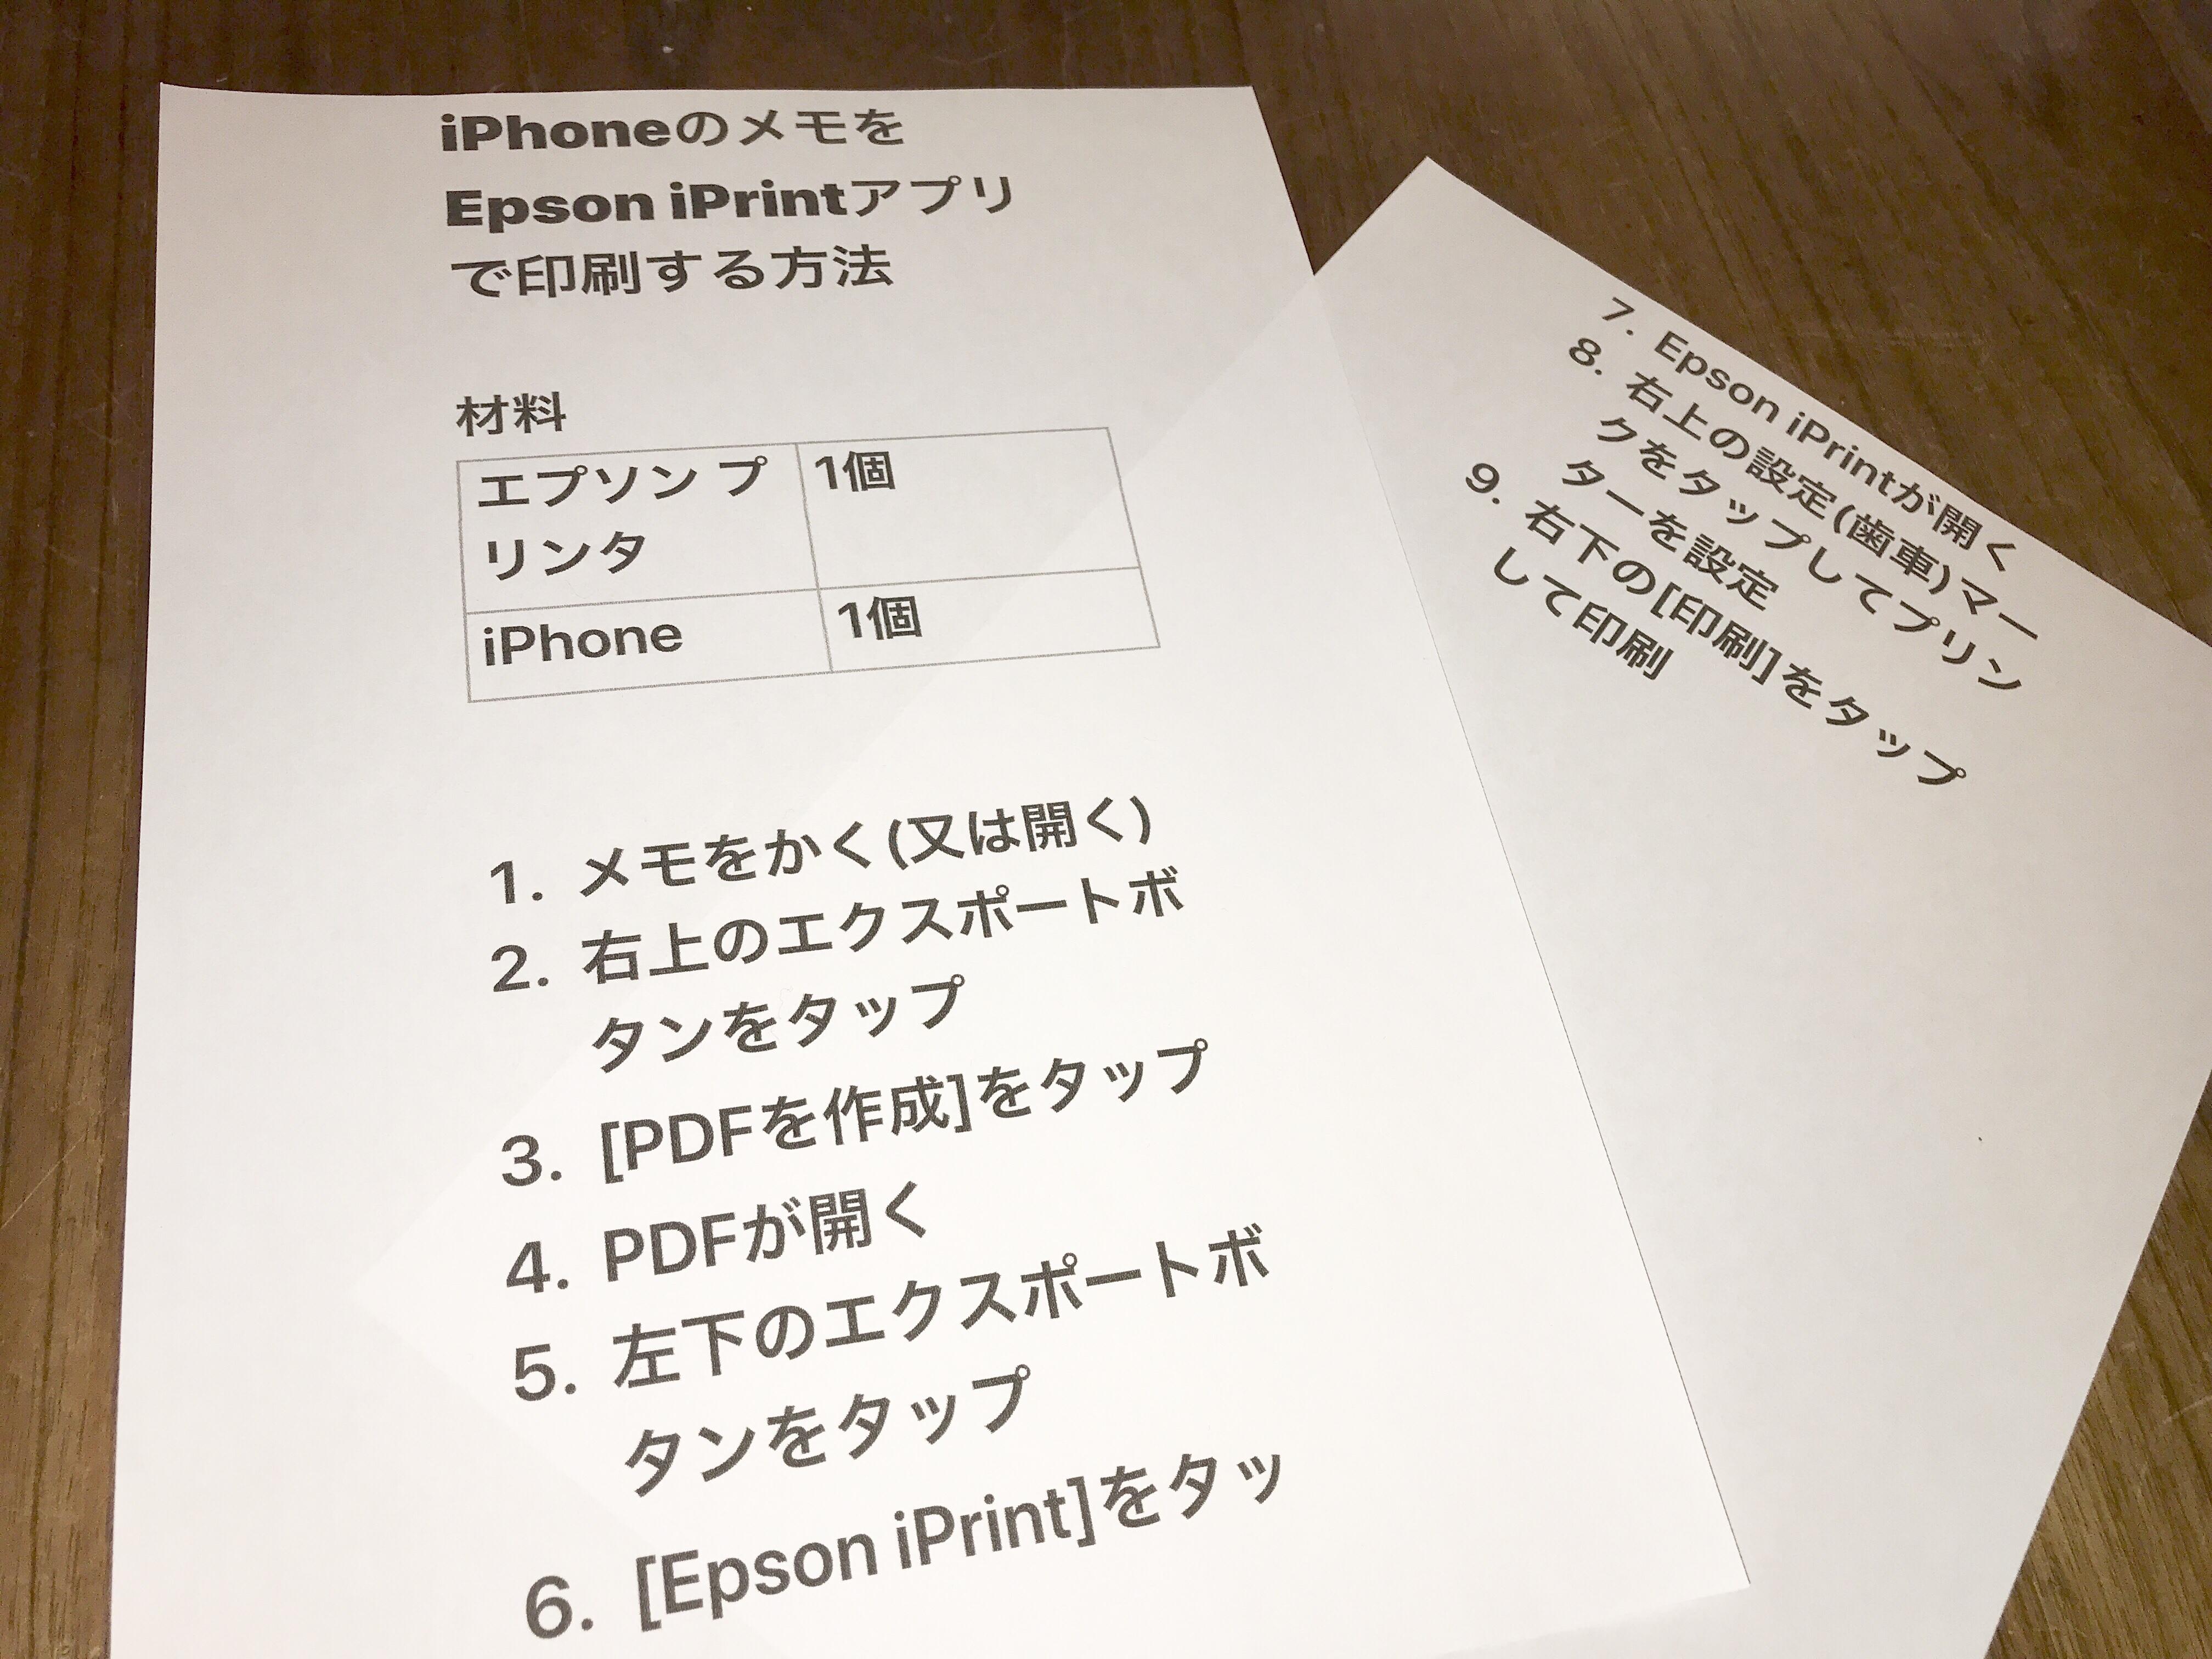 epson iprint pdf 印刷 iphone